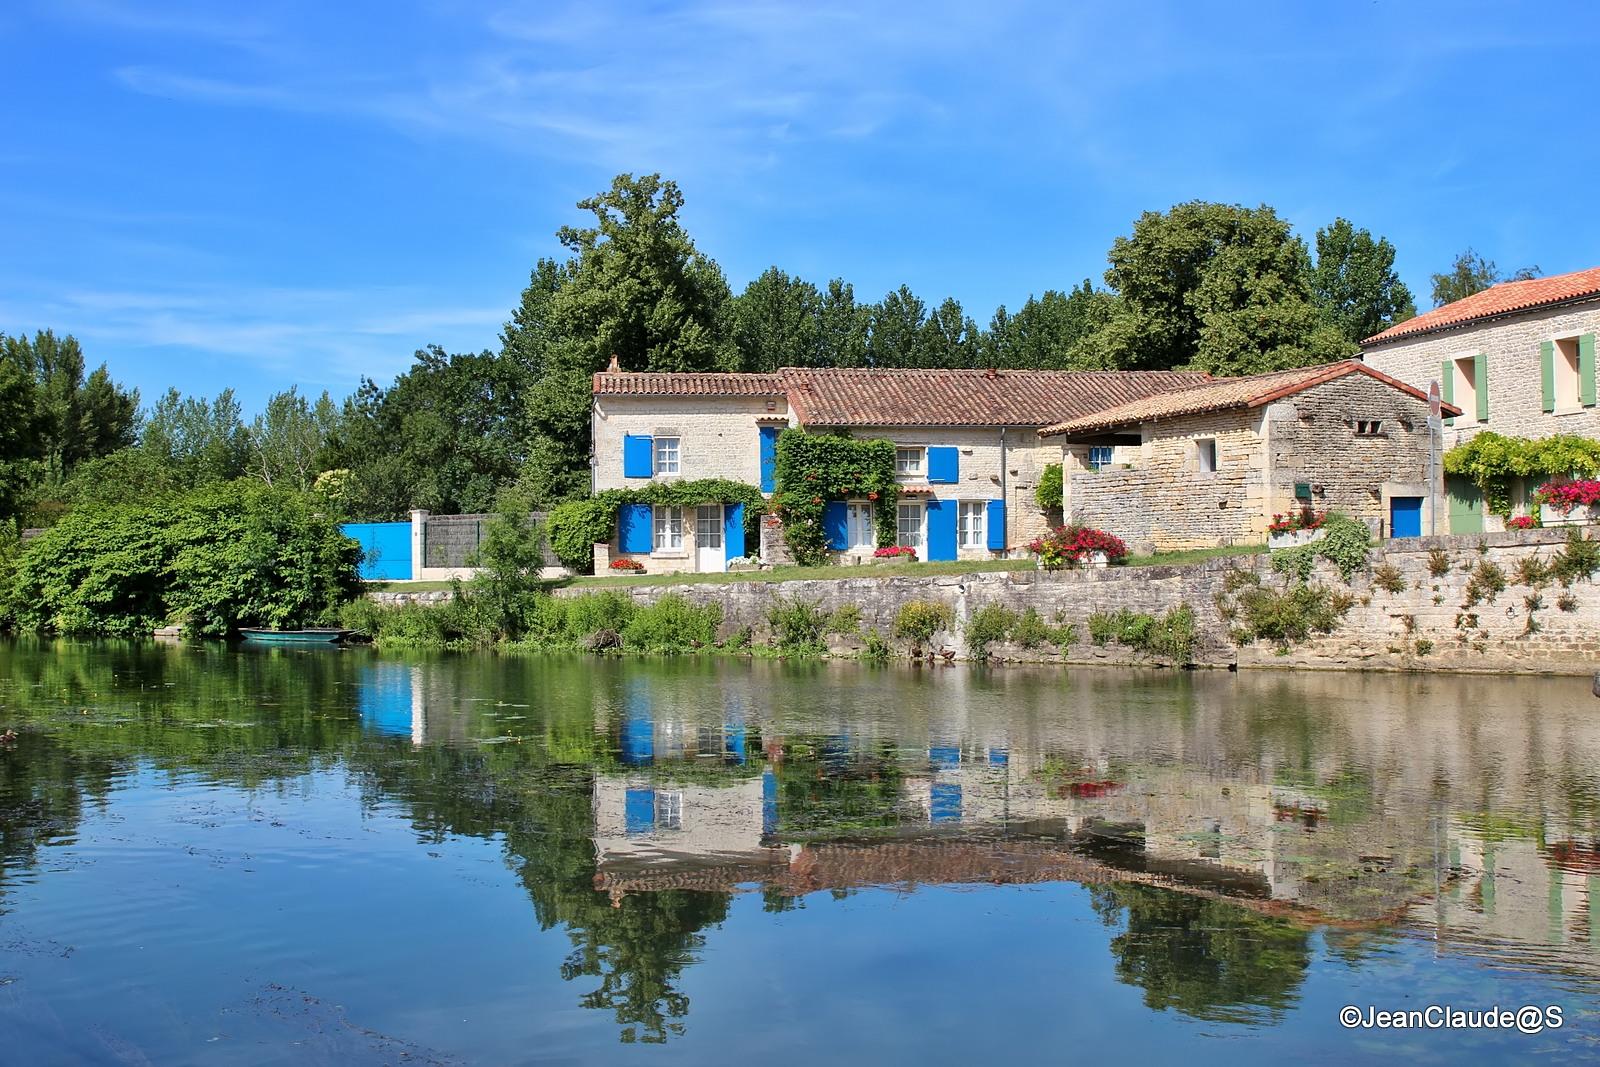 Le Marais Poitevin Img_0552_filtered-529c48e